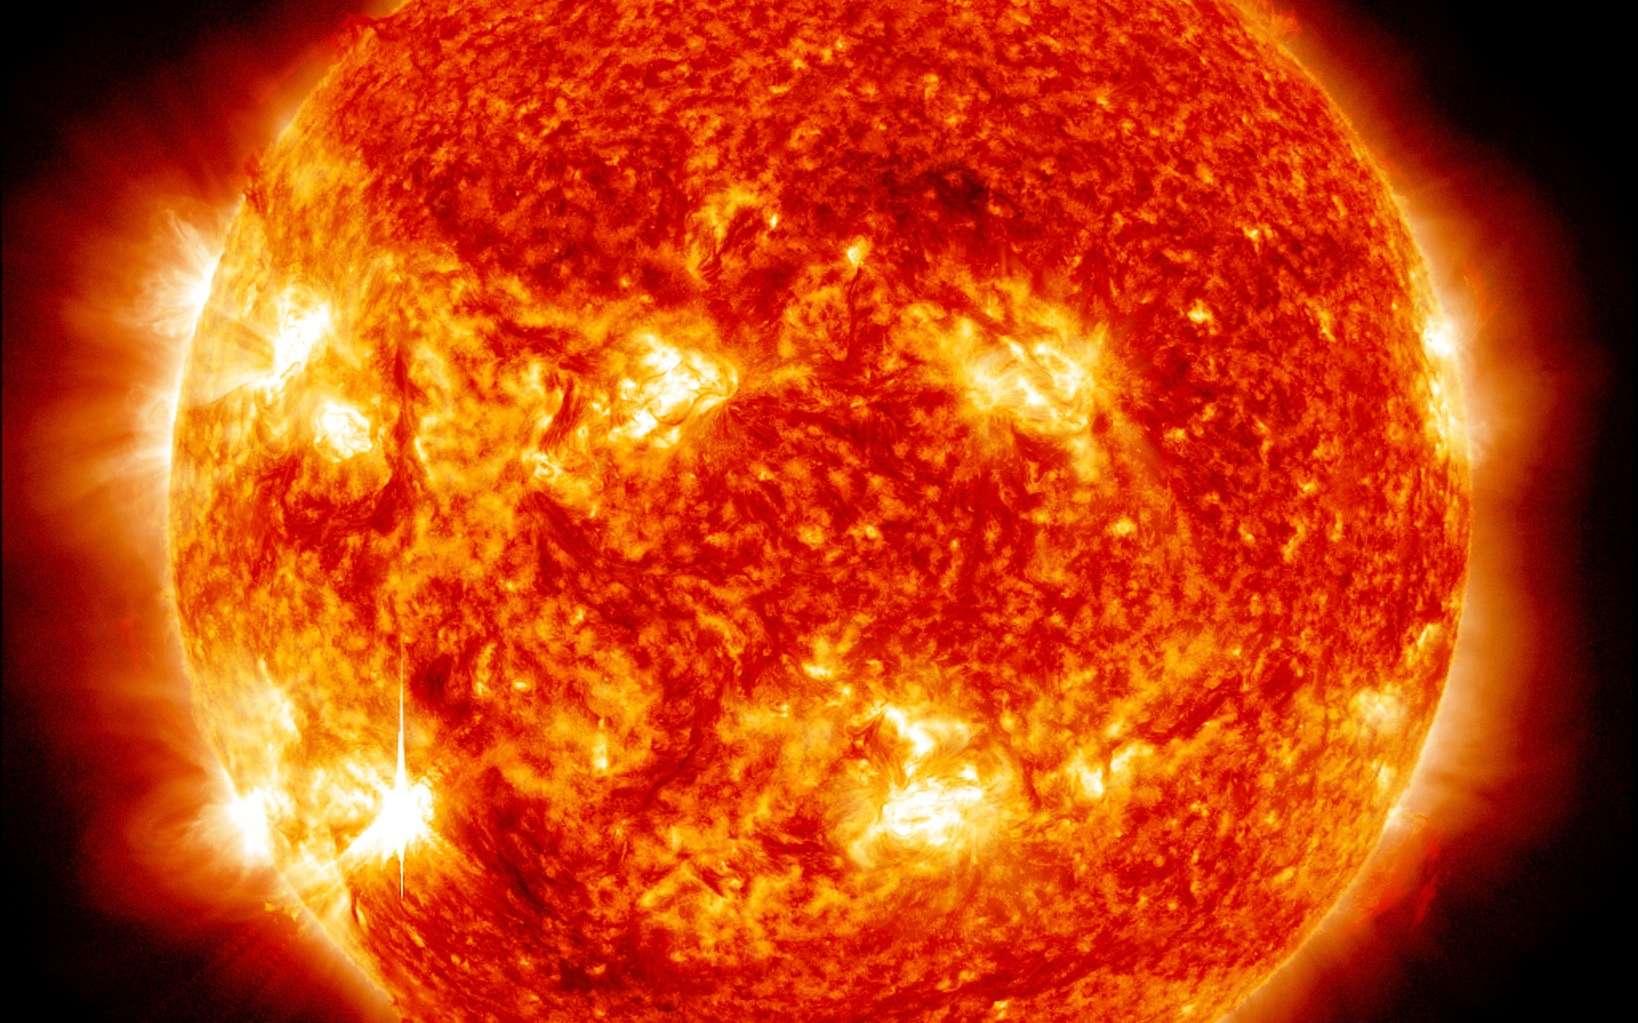 Une image du Soleil prise avec le satellite SDO. © Nasa, SDO